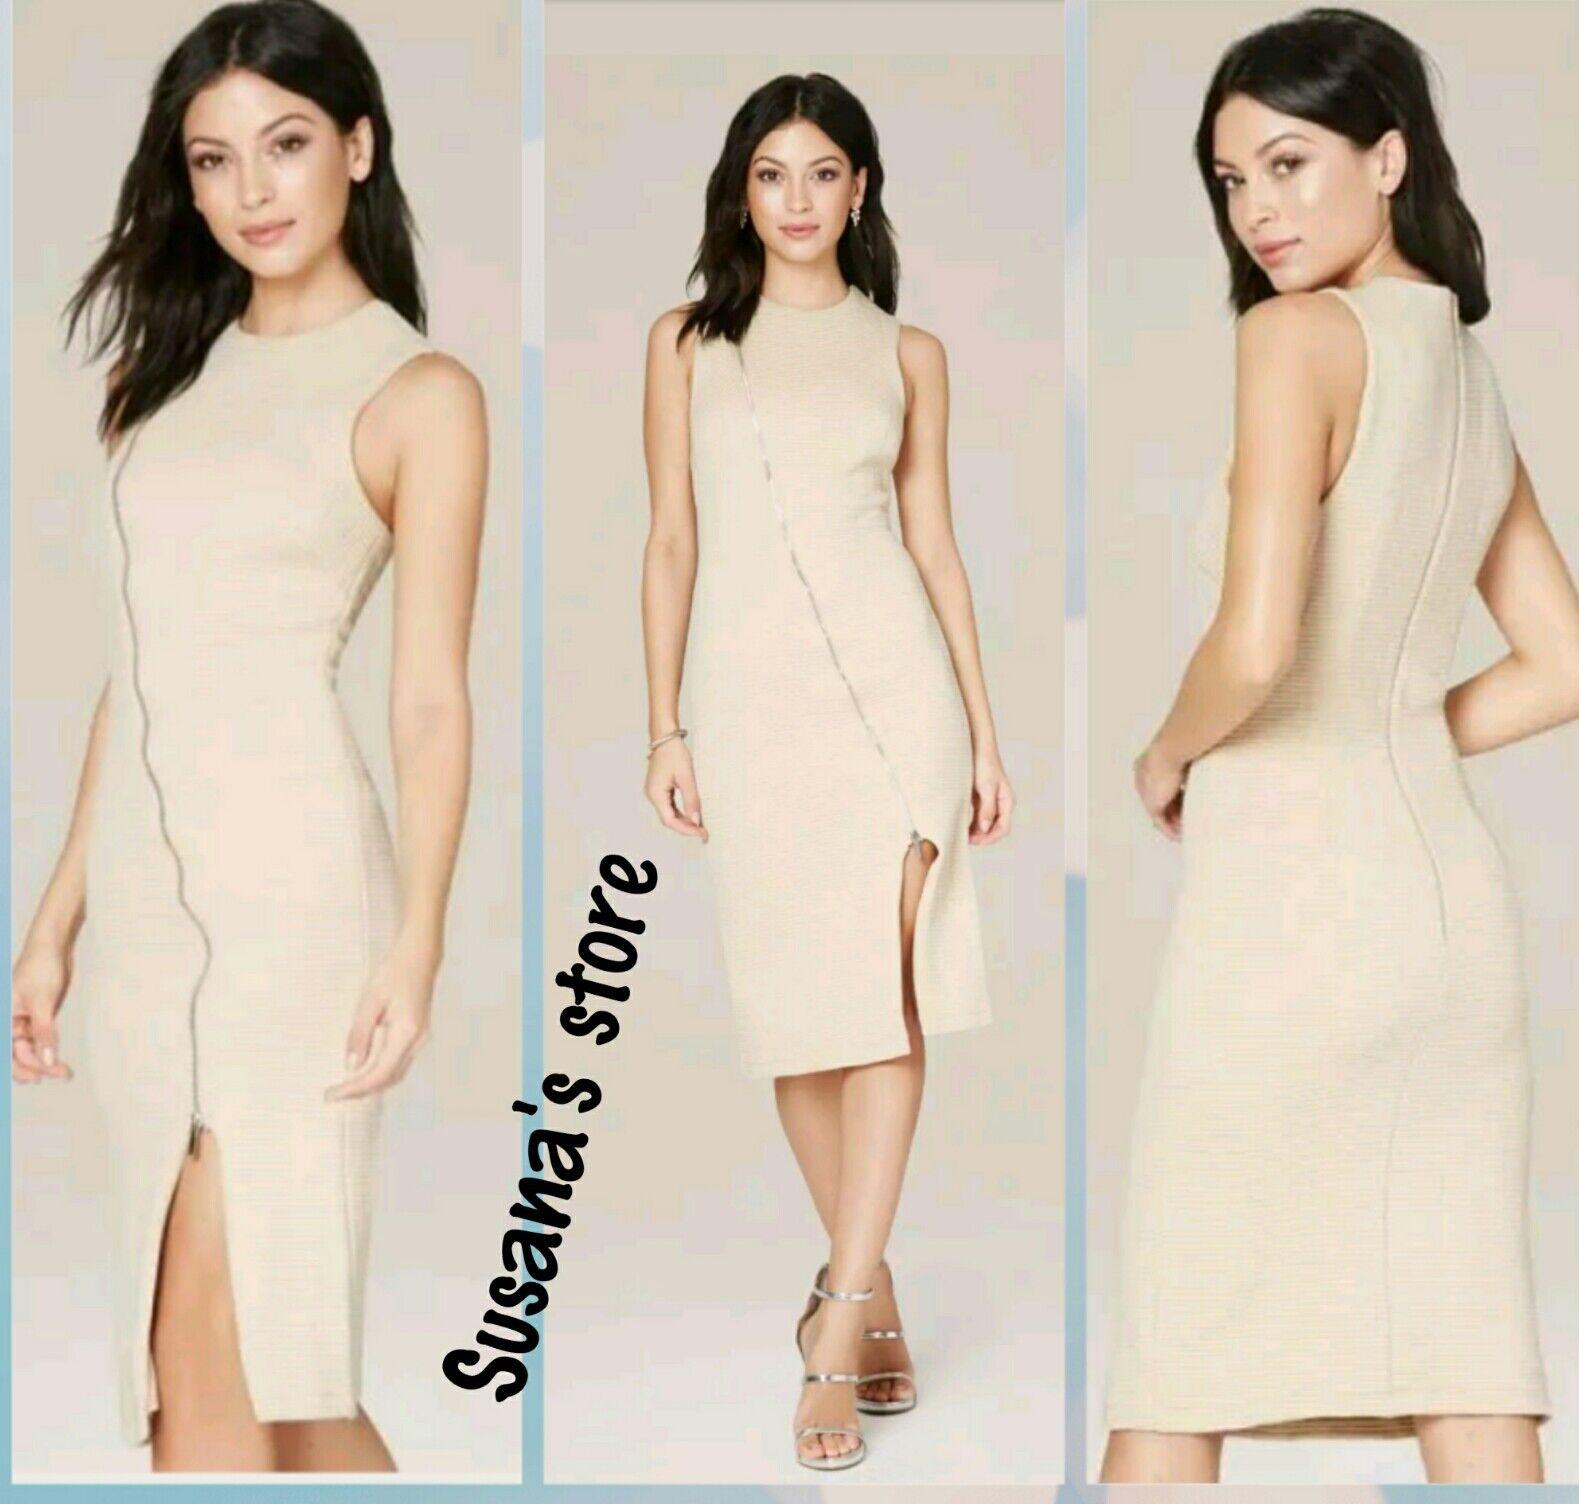 NWT BEBE REBECCA TEXTURED ZIP DRESS SIZE XS Career-move midi dress in a geo-text